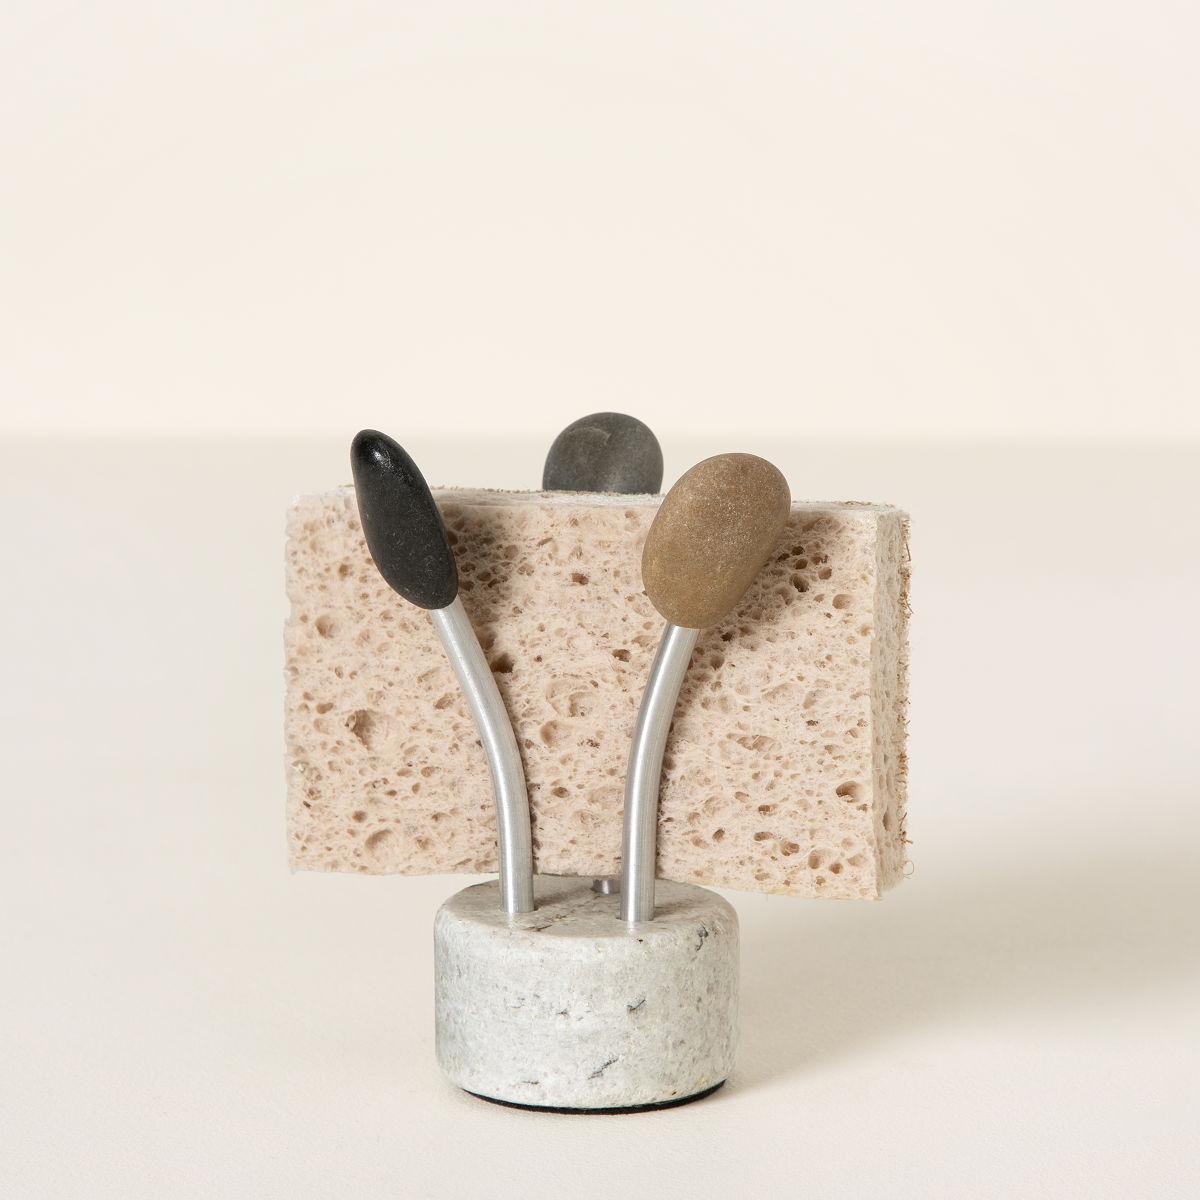 Ine design stone 187 other products - Sea Stone Splash Sponge Holder 1 Thumbnail